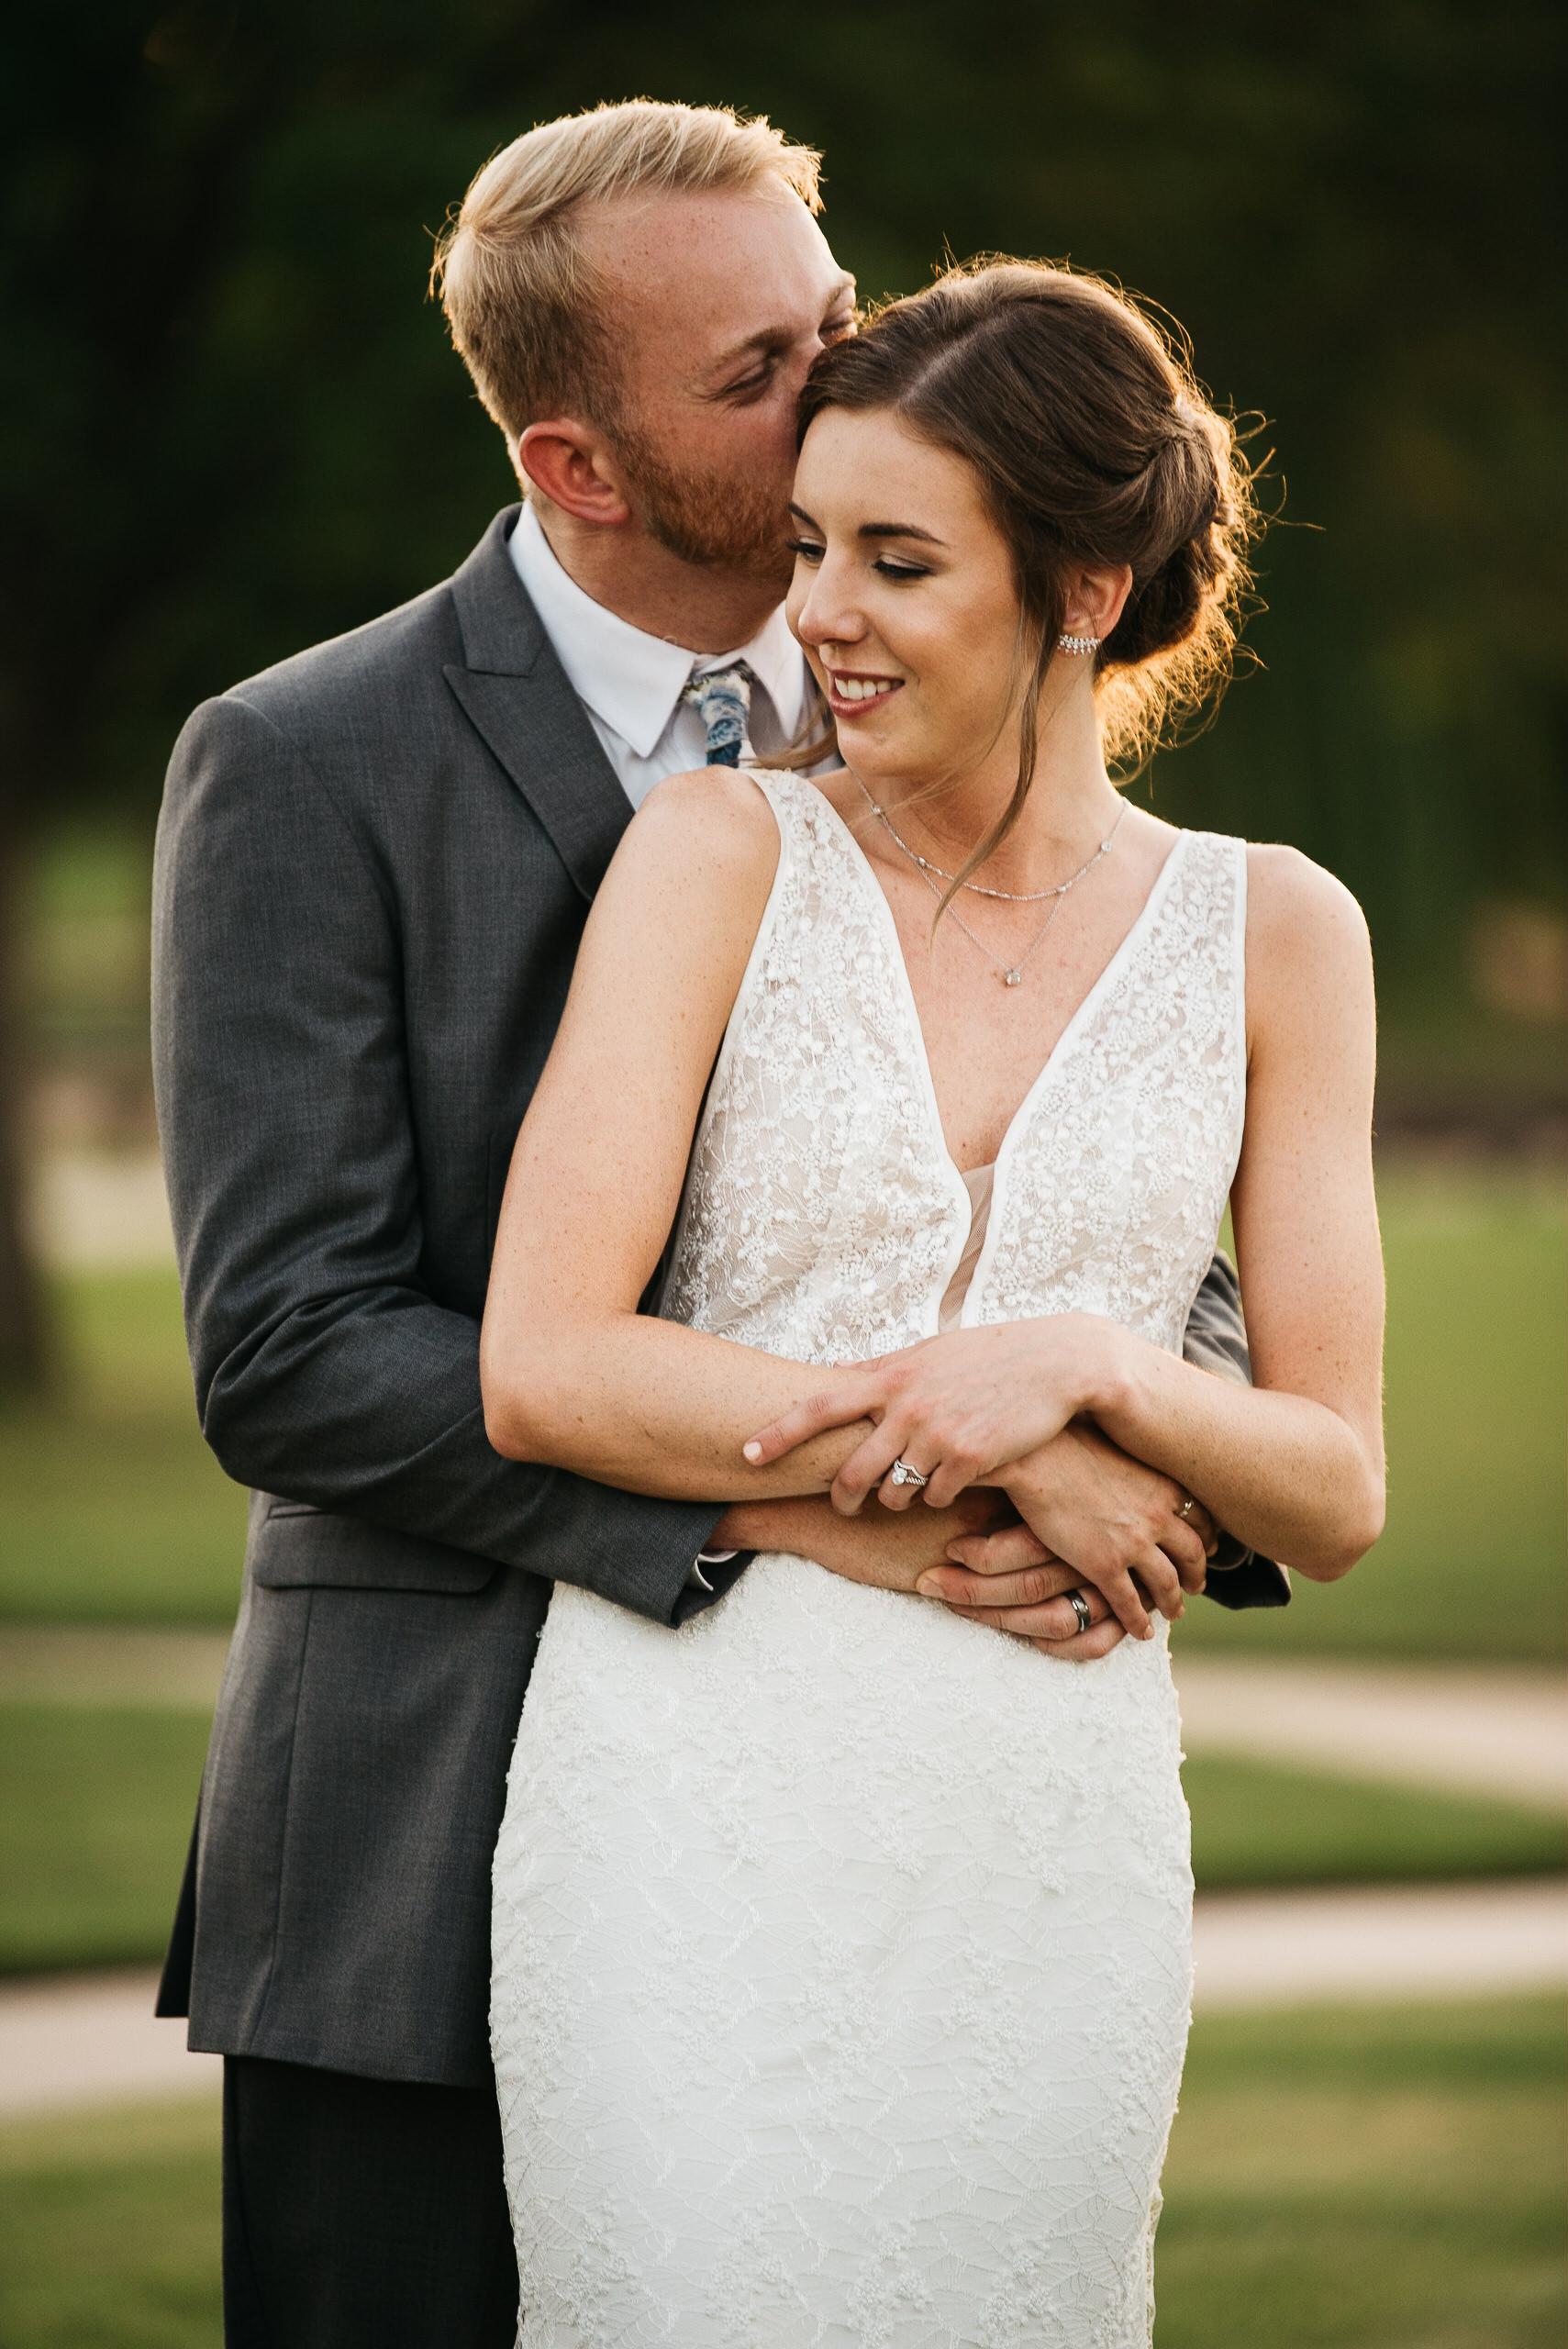 okc-wedding-photographer-coles-garden-wedding-okc-best-wedding-photographers-142.jpg